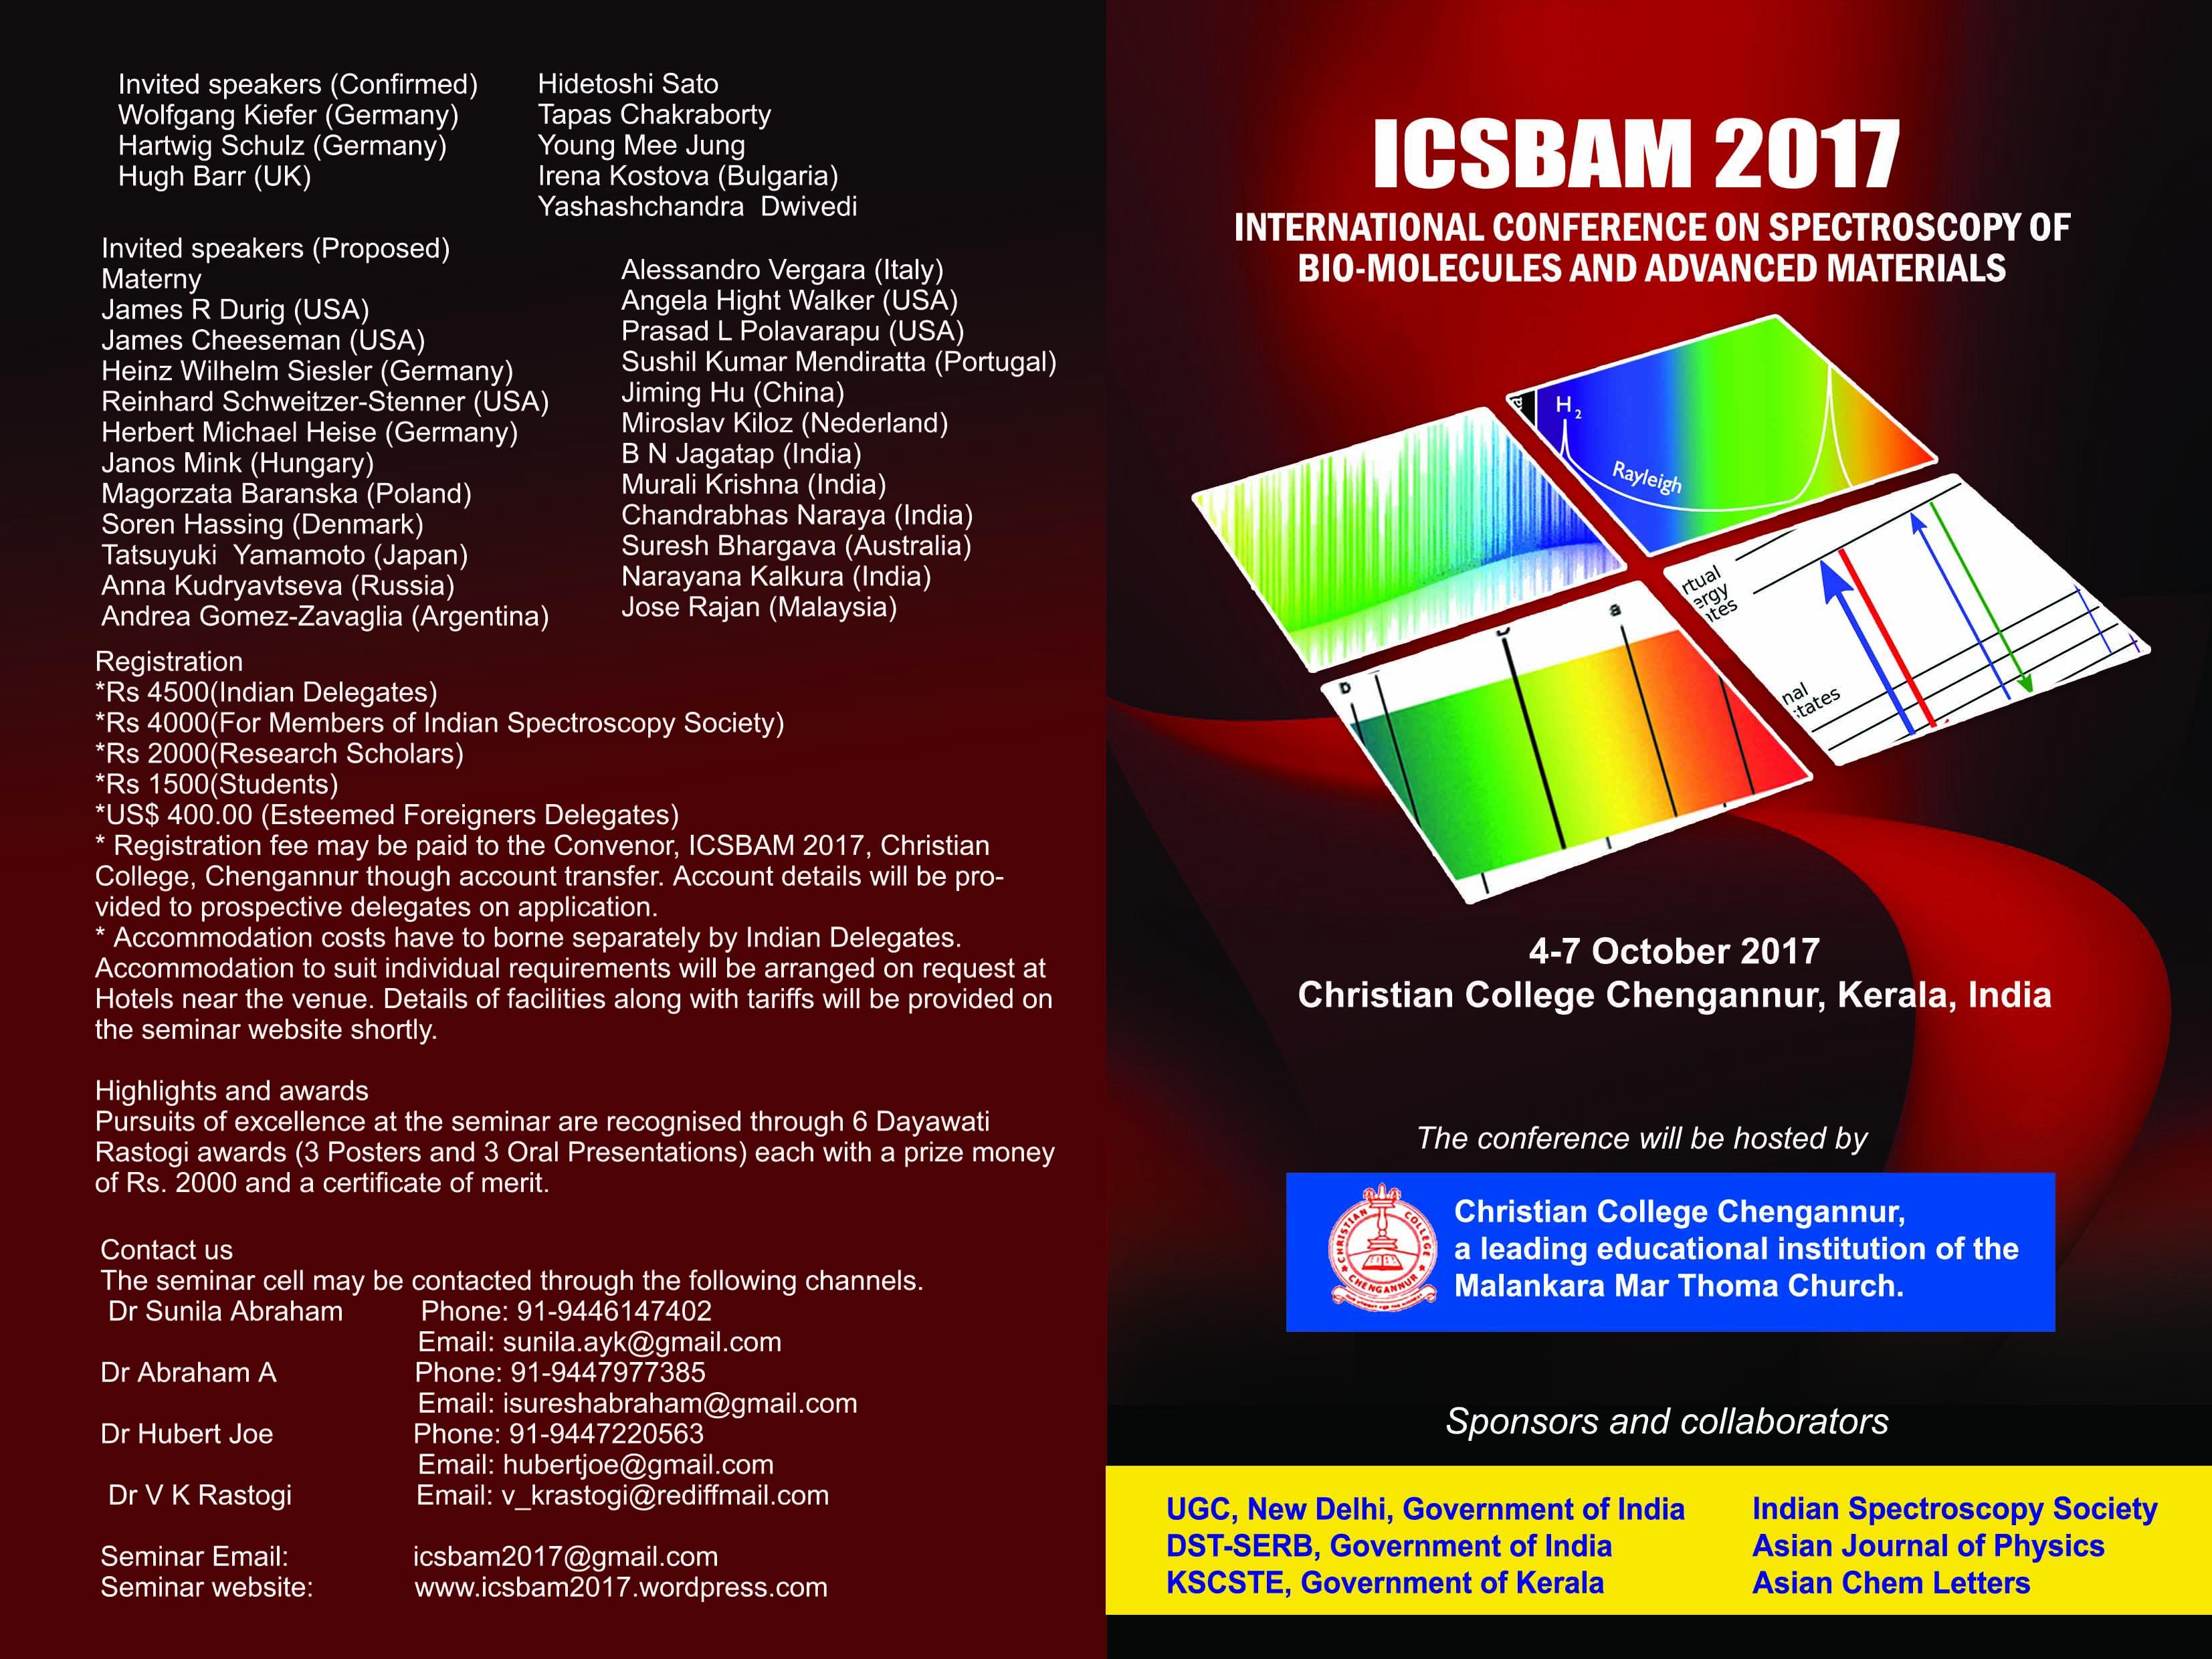 ICSBA-2017